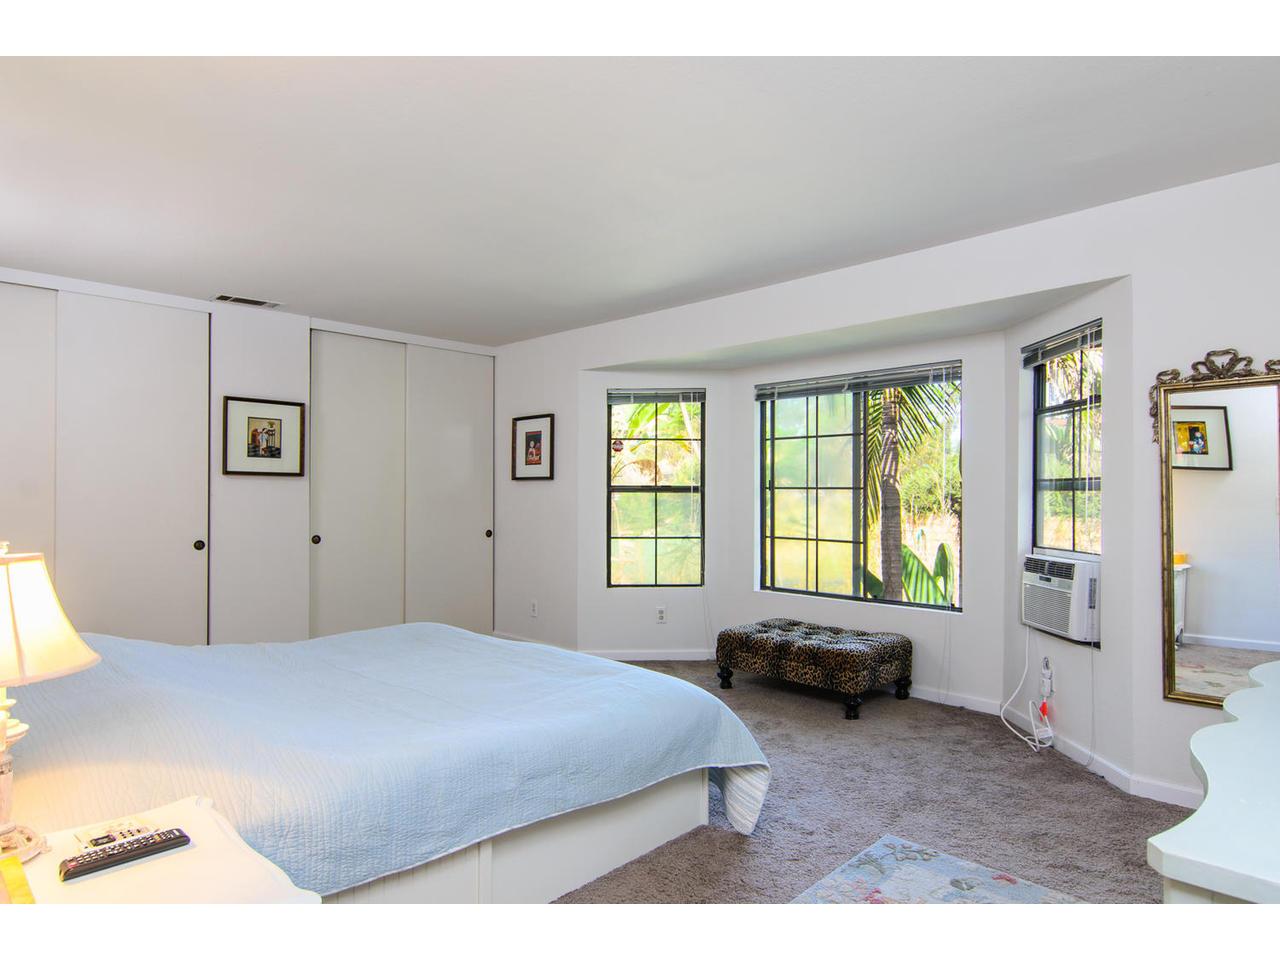 3579 Curlew Street San Diego-MLS_Size-014-3579 Curlew Street San Diego-1280x960-72dpi.jpg